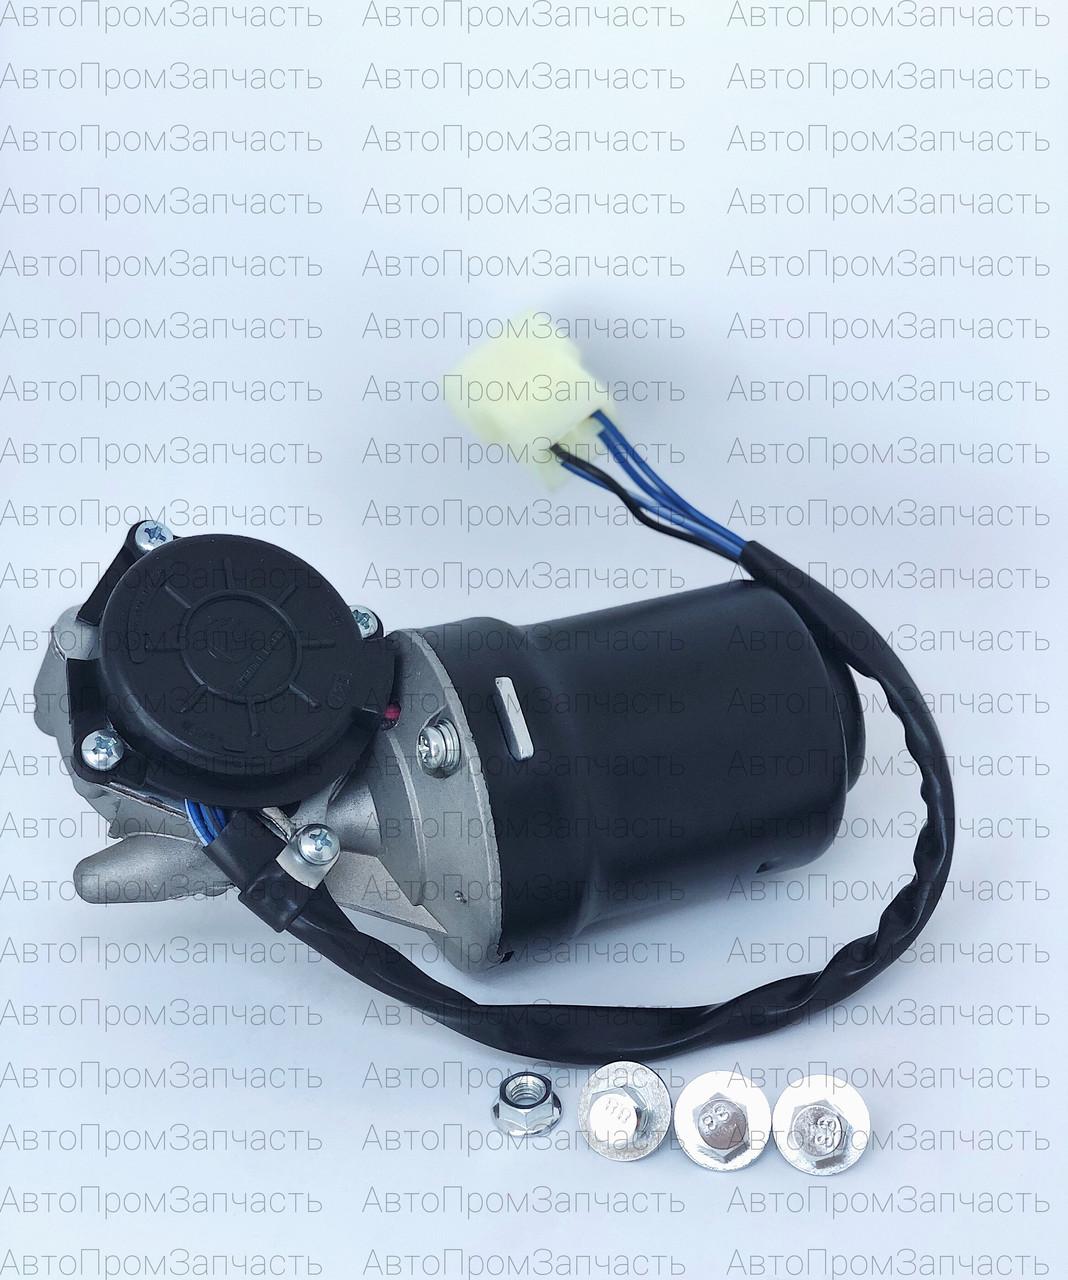 Мотор стеклоочистителя ВАЗ 2101, 2102, 2103, 2104, 2105, 2106, 2107, 2121 МЕ241 Калуга